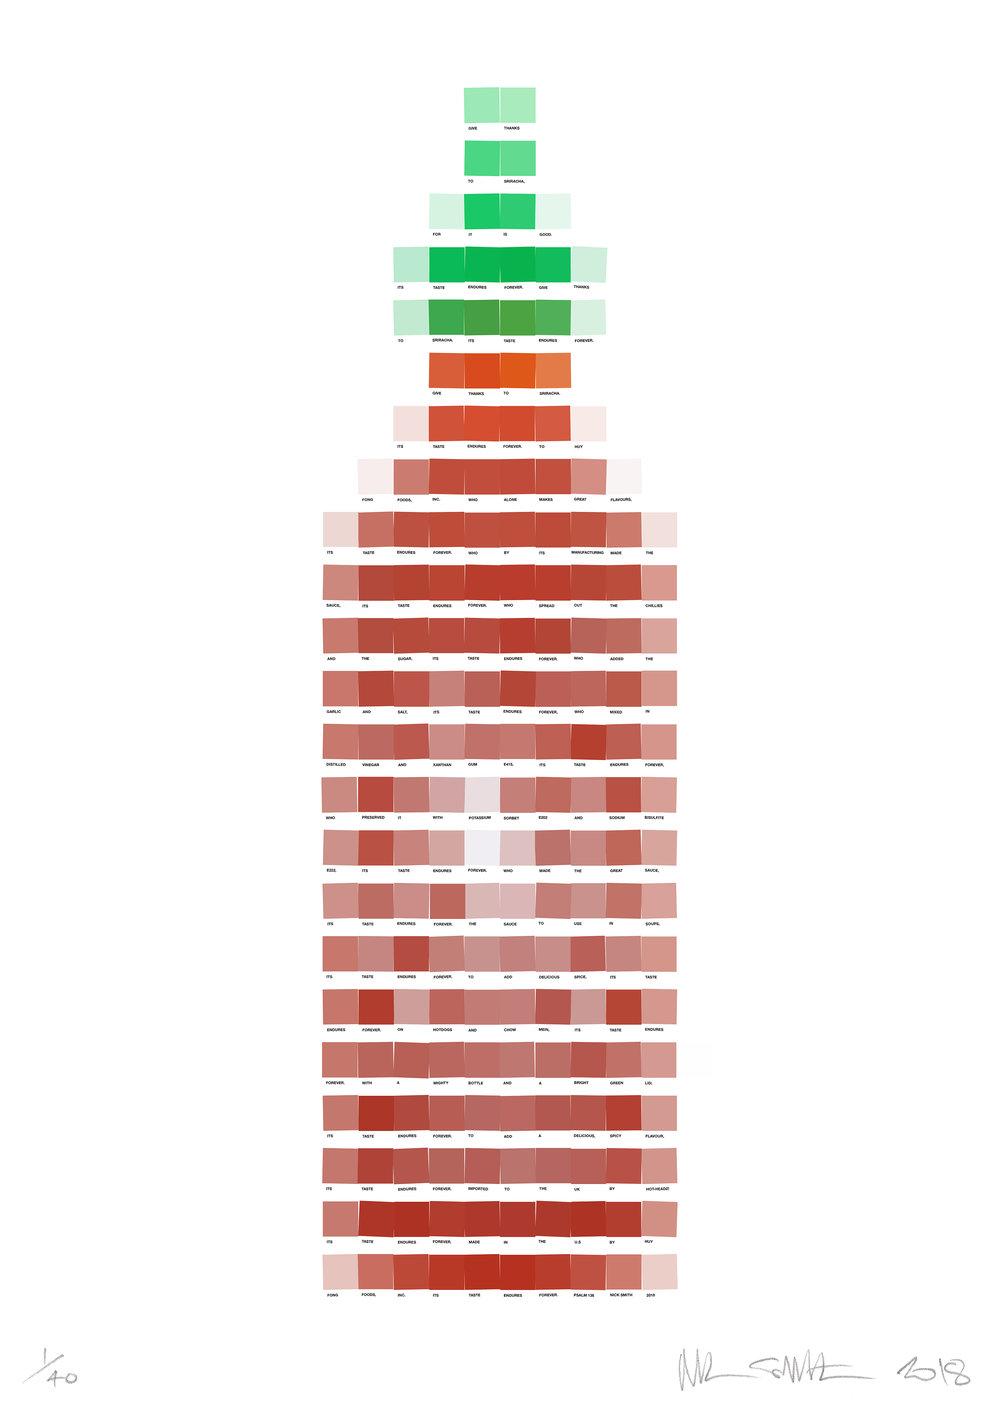 Psalm 138 - Sriracha Sauce